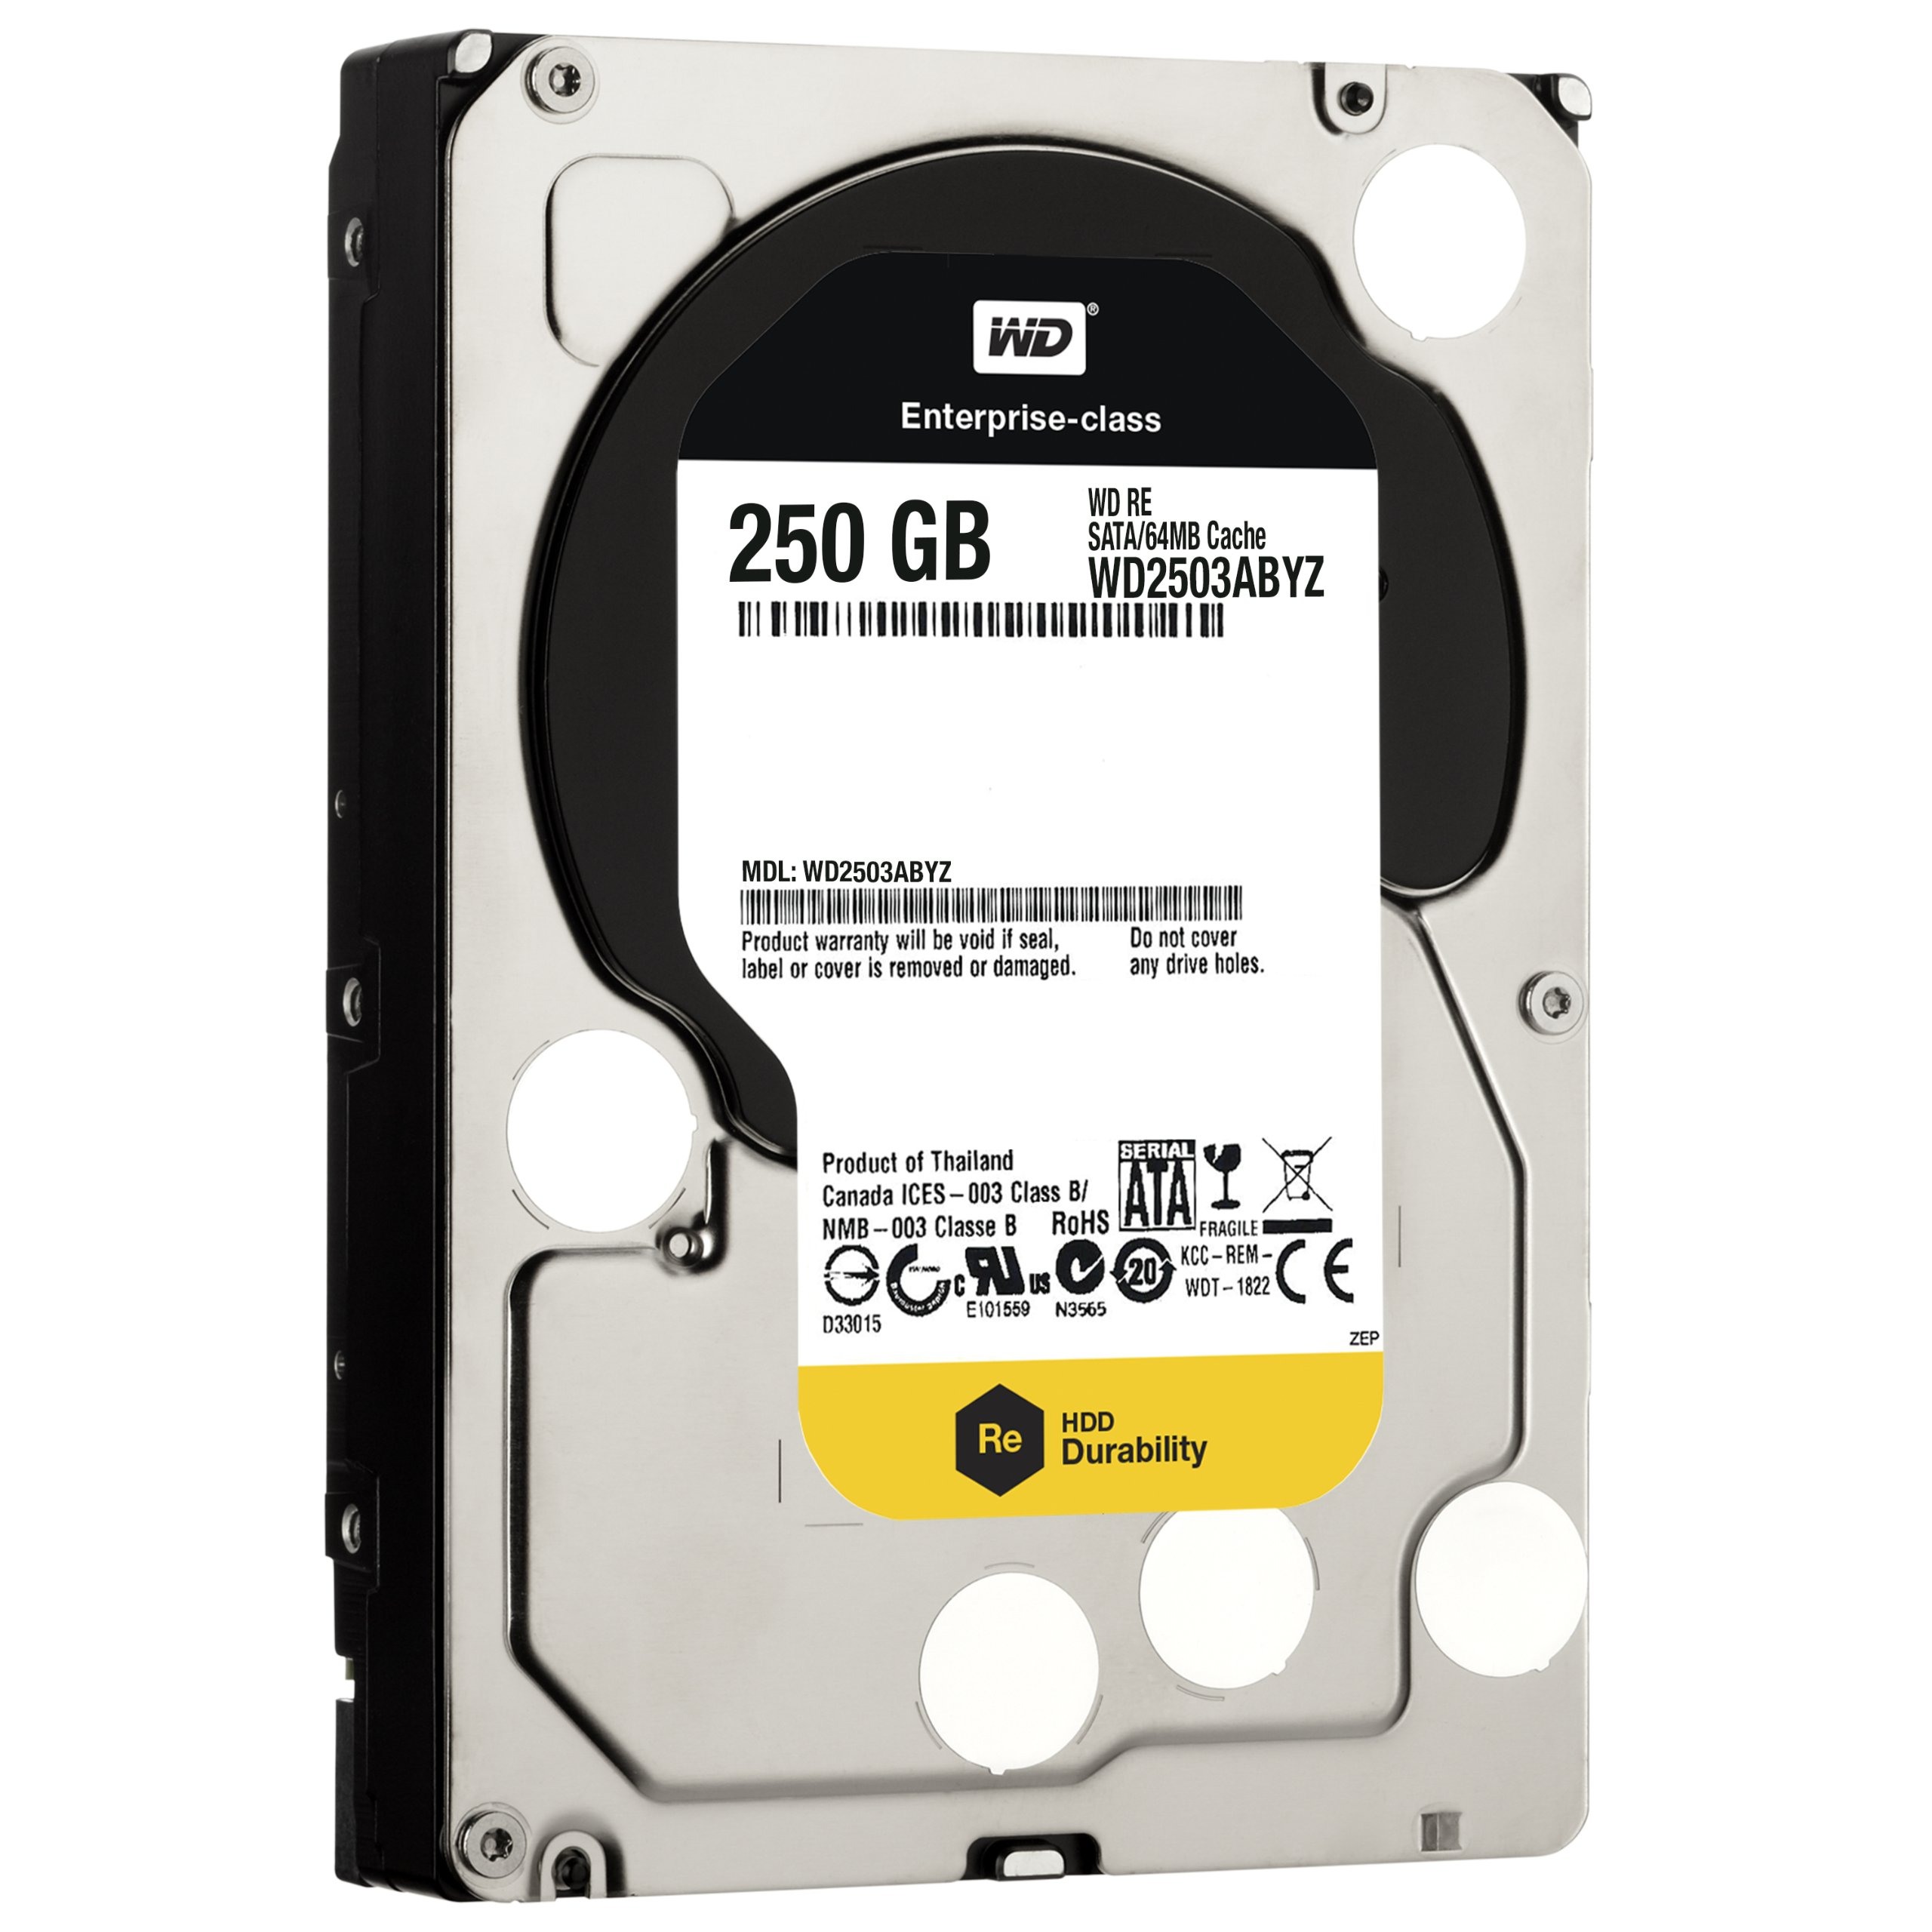 WD  250 GB WD RE SATA III 7200 RPM 64 MB Cache Bulk/OEM Enterprise Hard Drive WD2503ABYZ by Western Digital